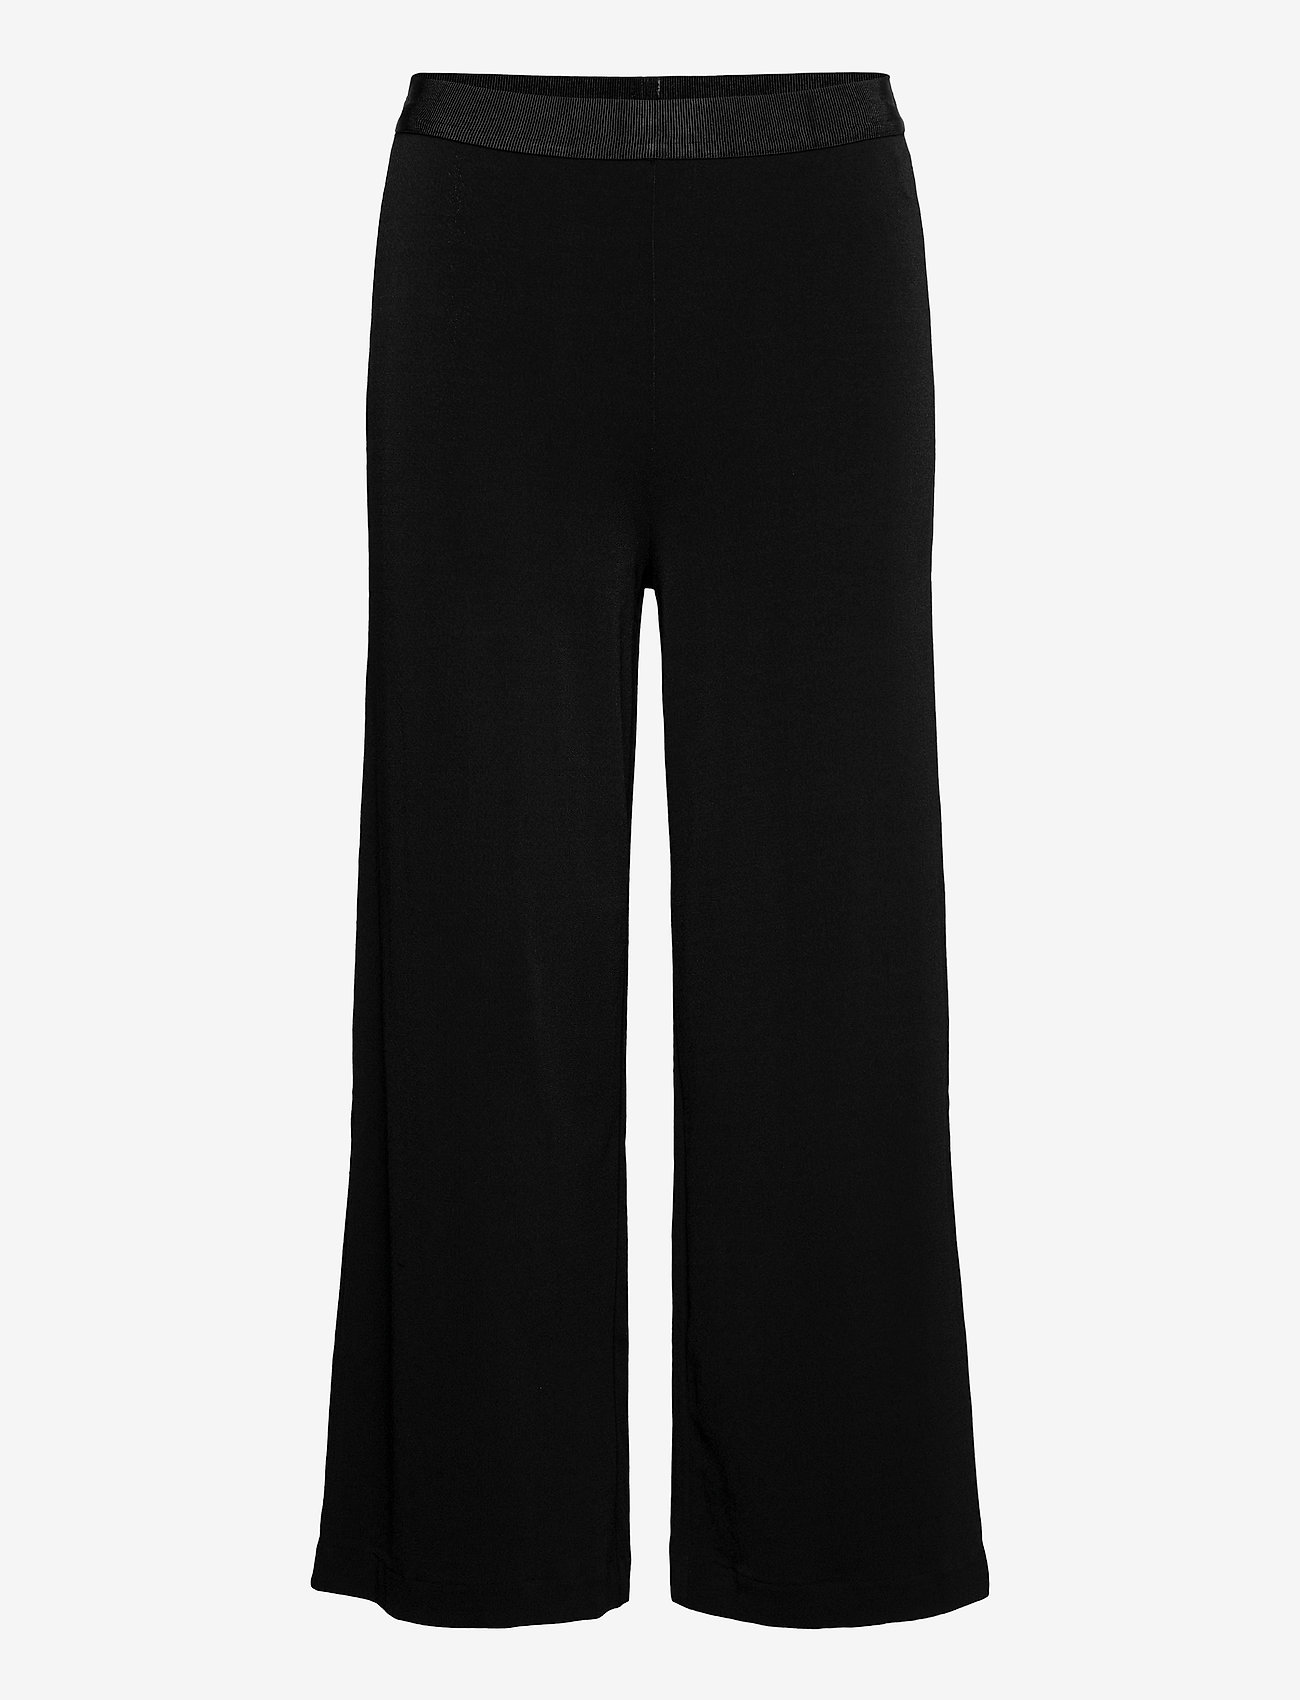 By Malene Birger - MALINE - bukser med brede ben - black - 0